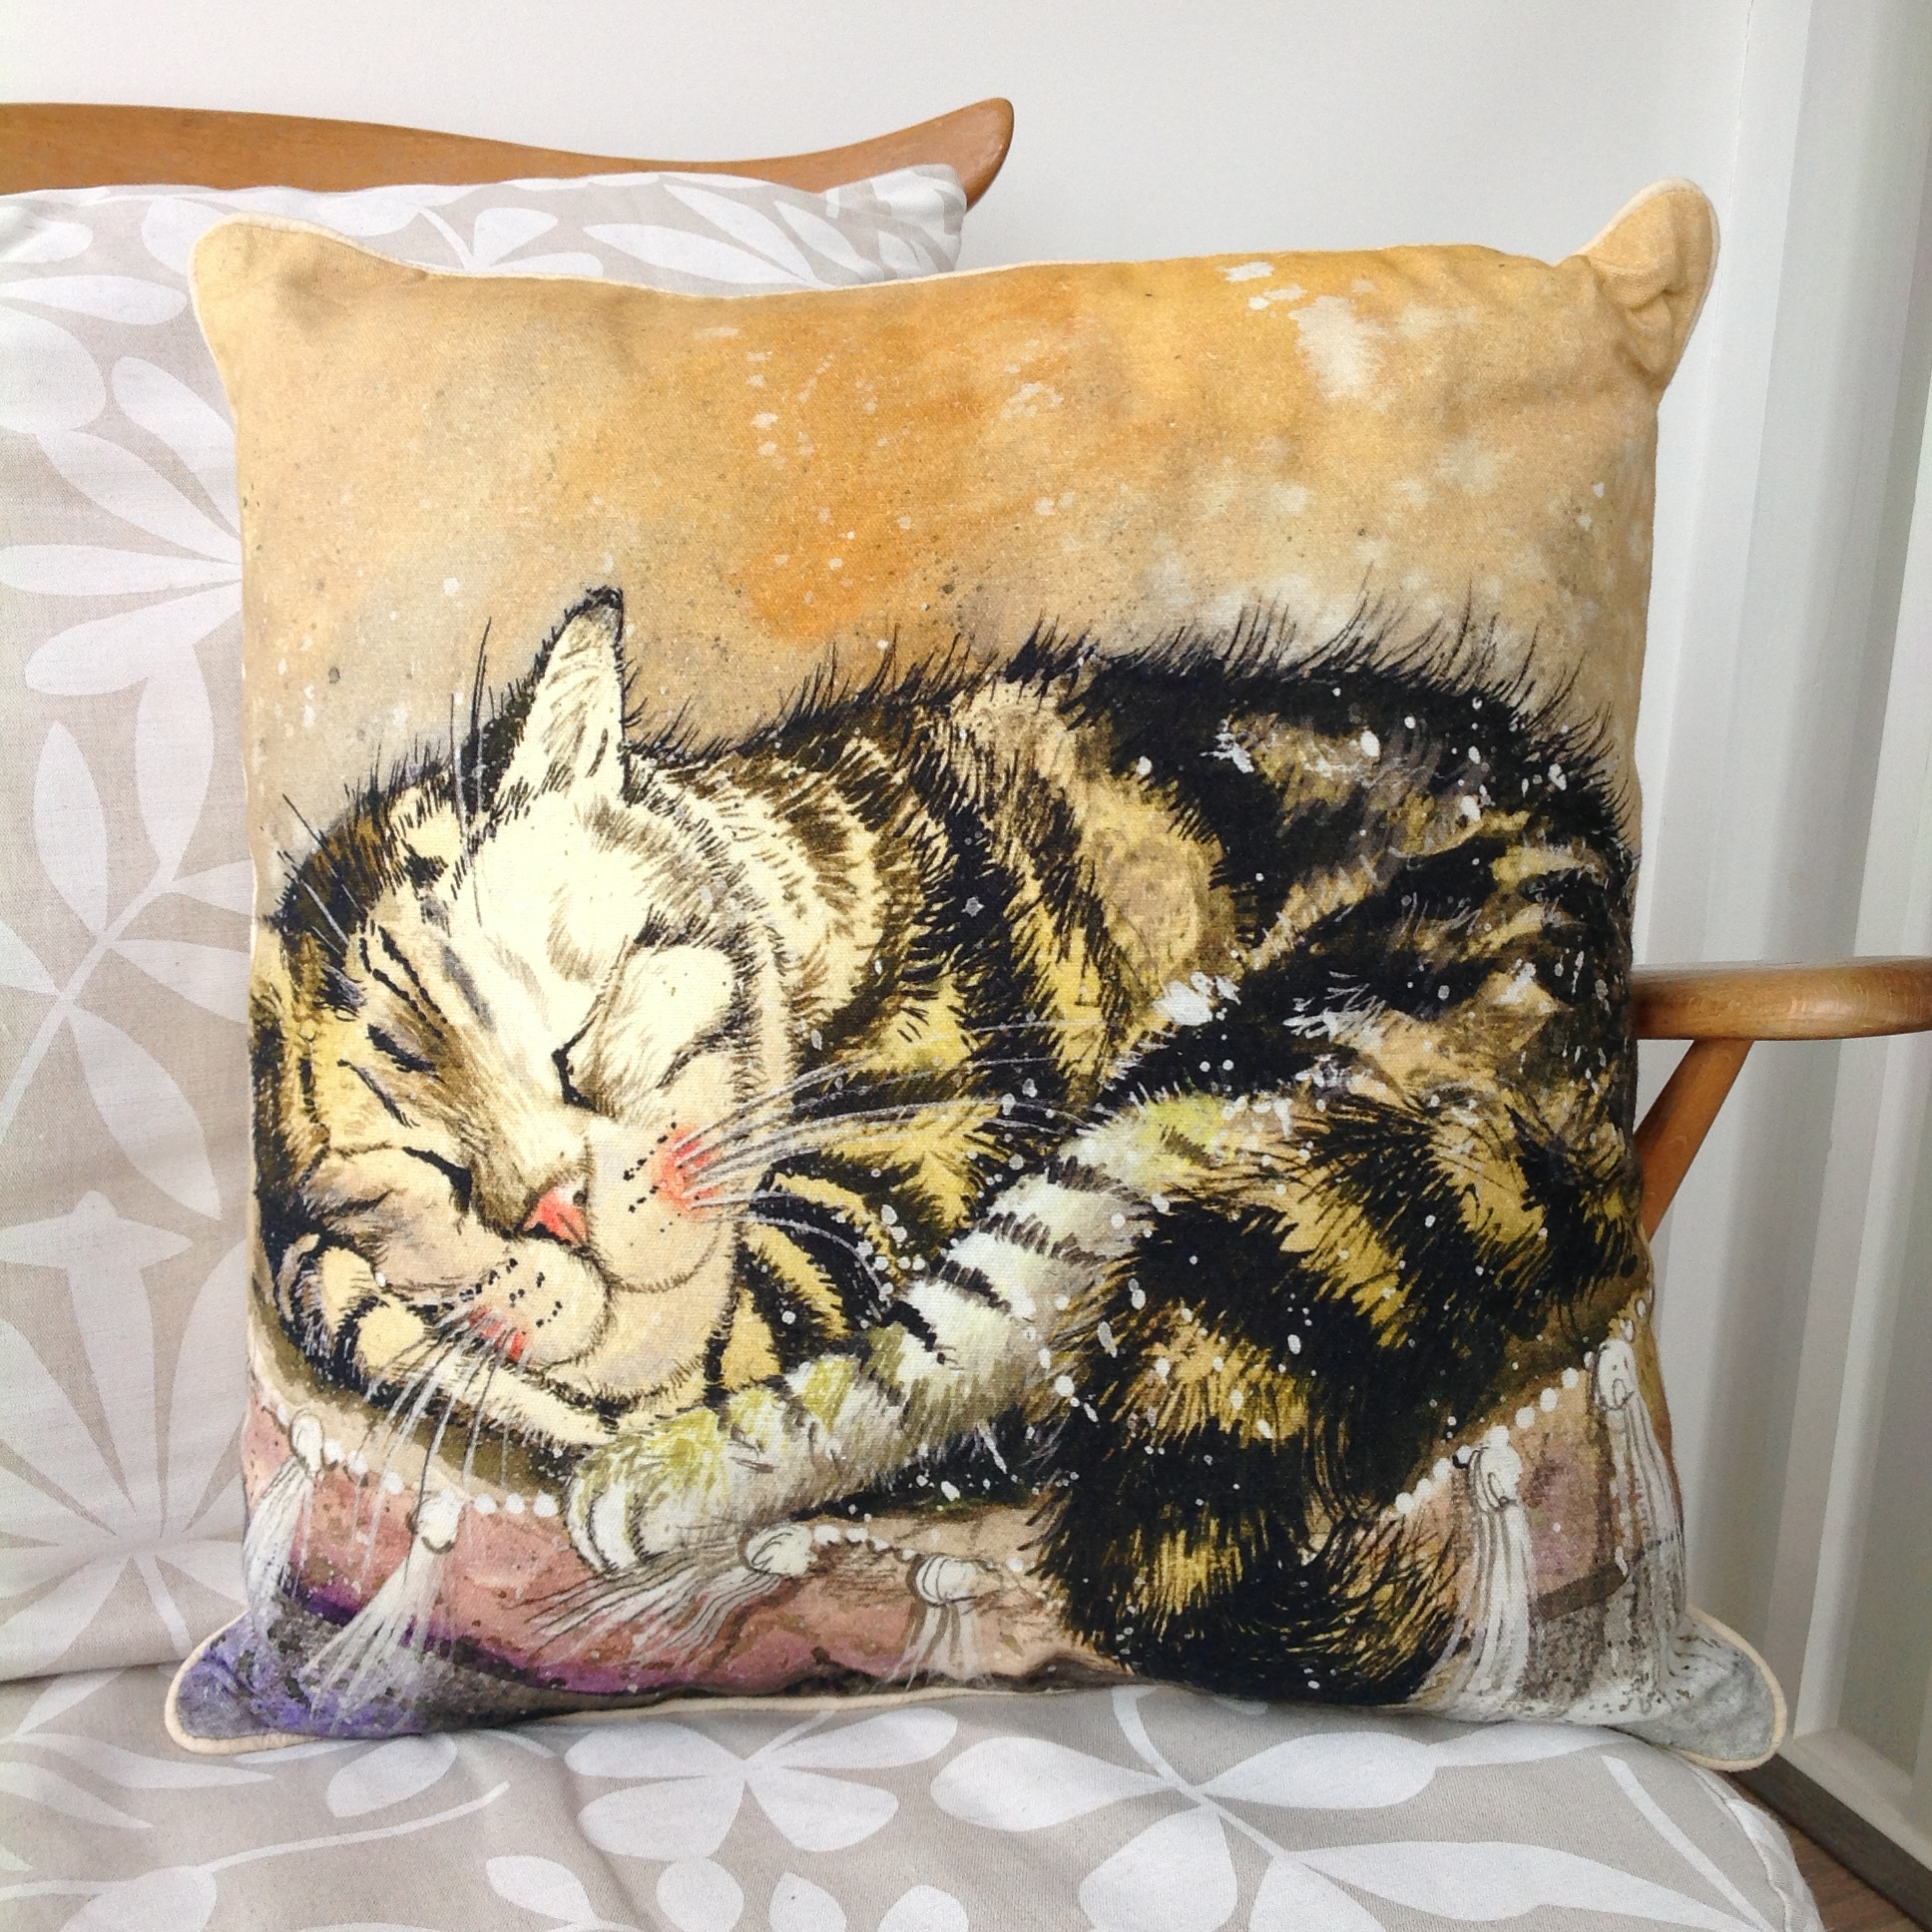 catalog/products/cushions/sleeping-cat-cushion.JPG